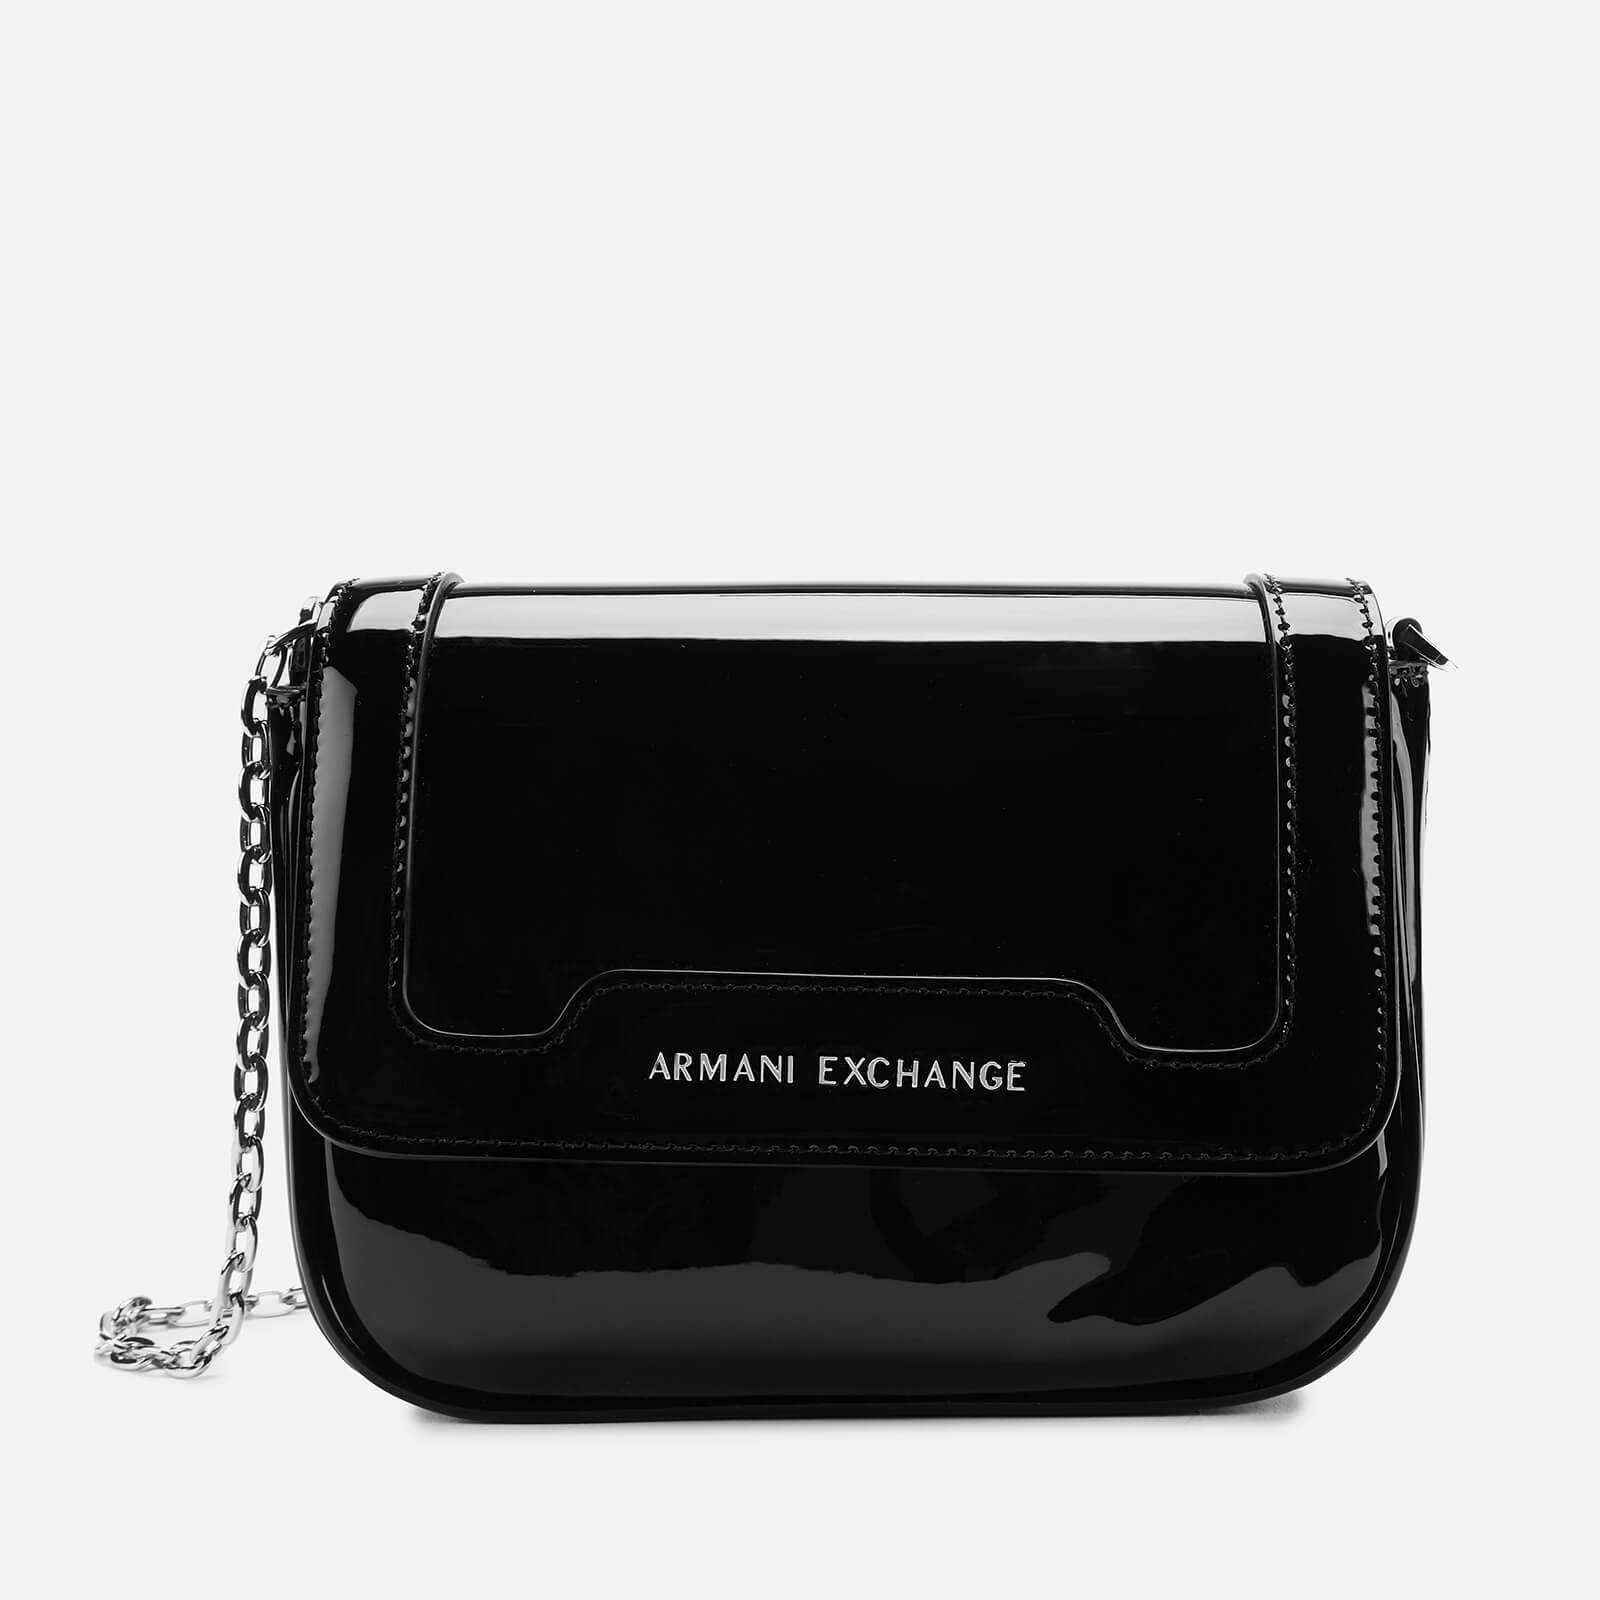 a283d934fe Armani Exchange Women's Patent Small Cross Body Bag - Black